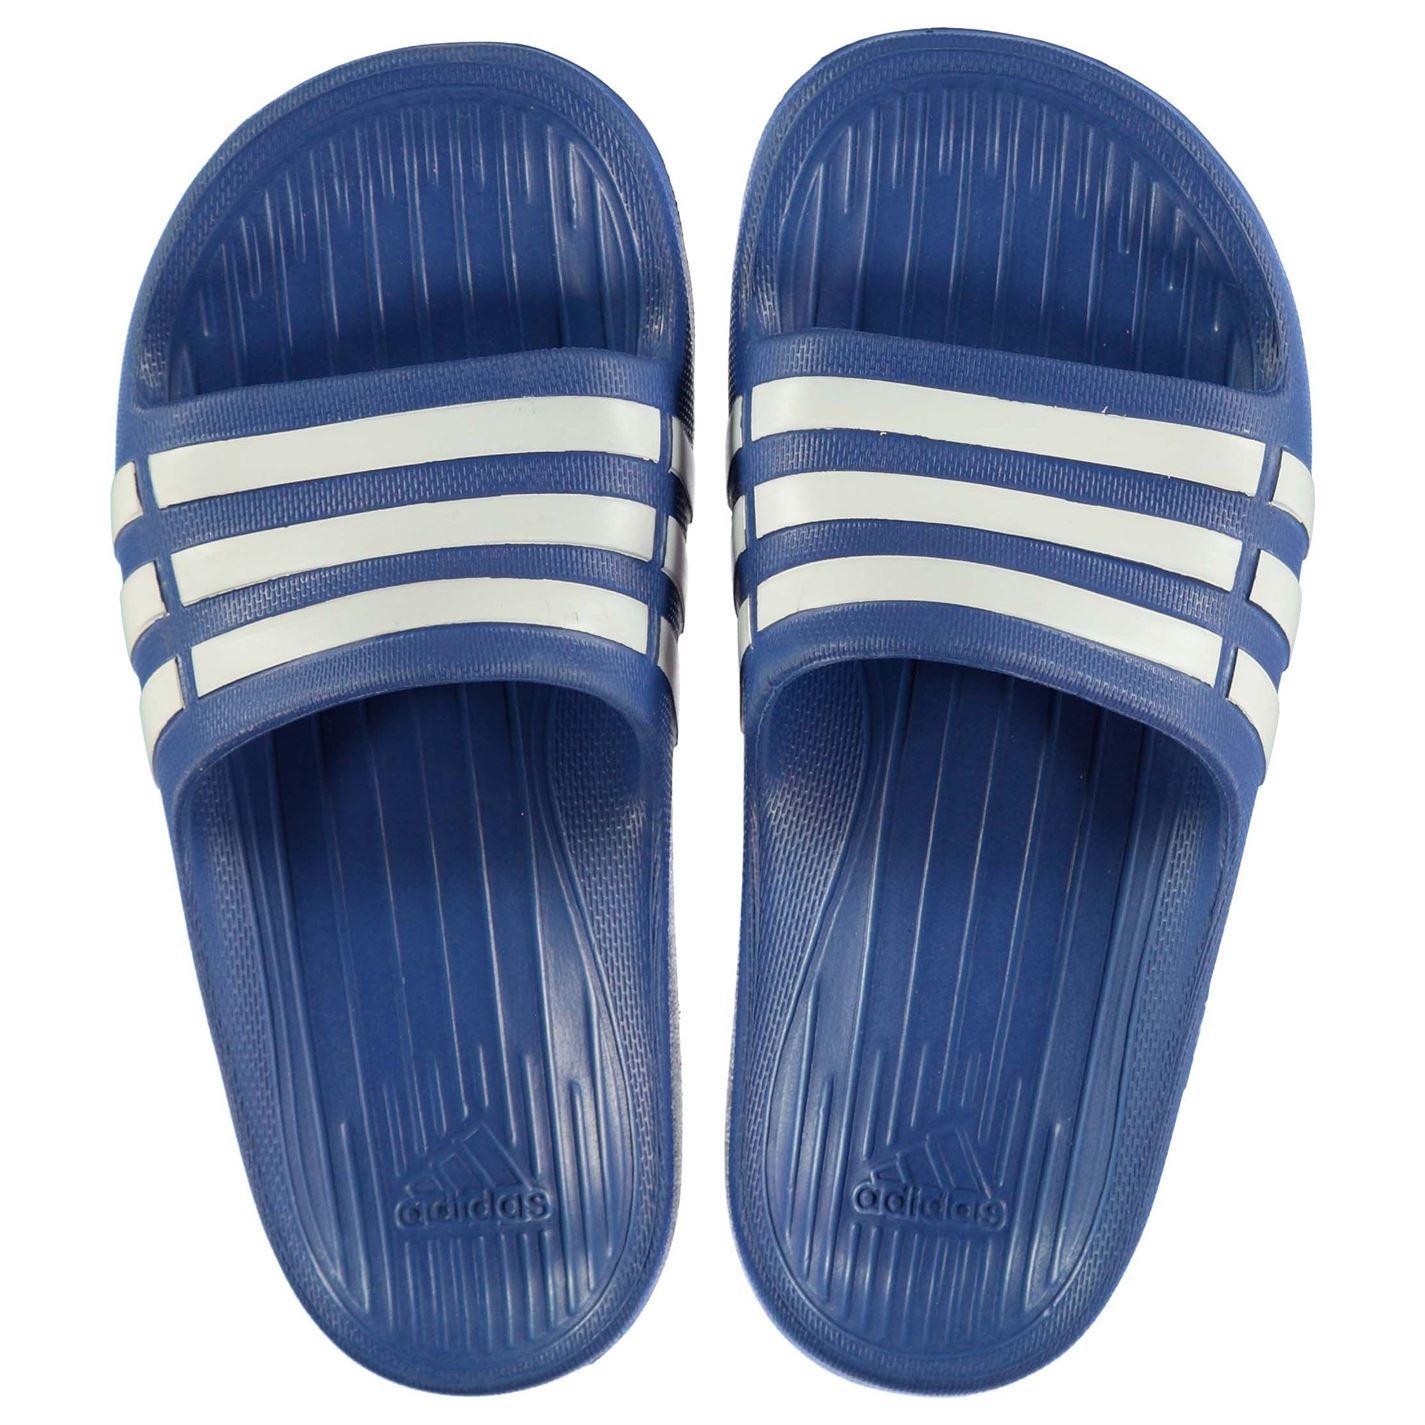 miniatura 10 - ADIDAS-Duramo-Slide-Piscina-Scarpe-Bambino-Ragazzo-Sandali-Infradito-Spiaggia-Scarpe-Thongs